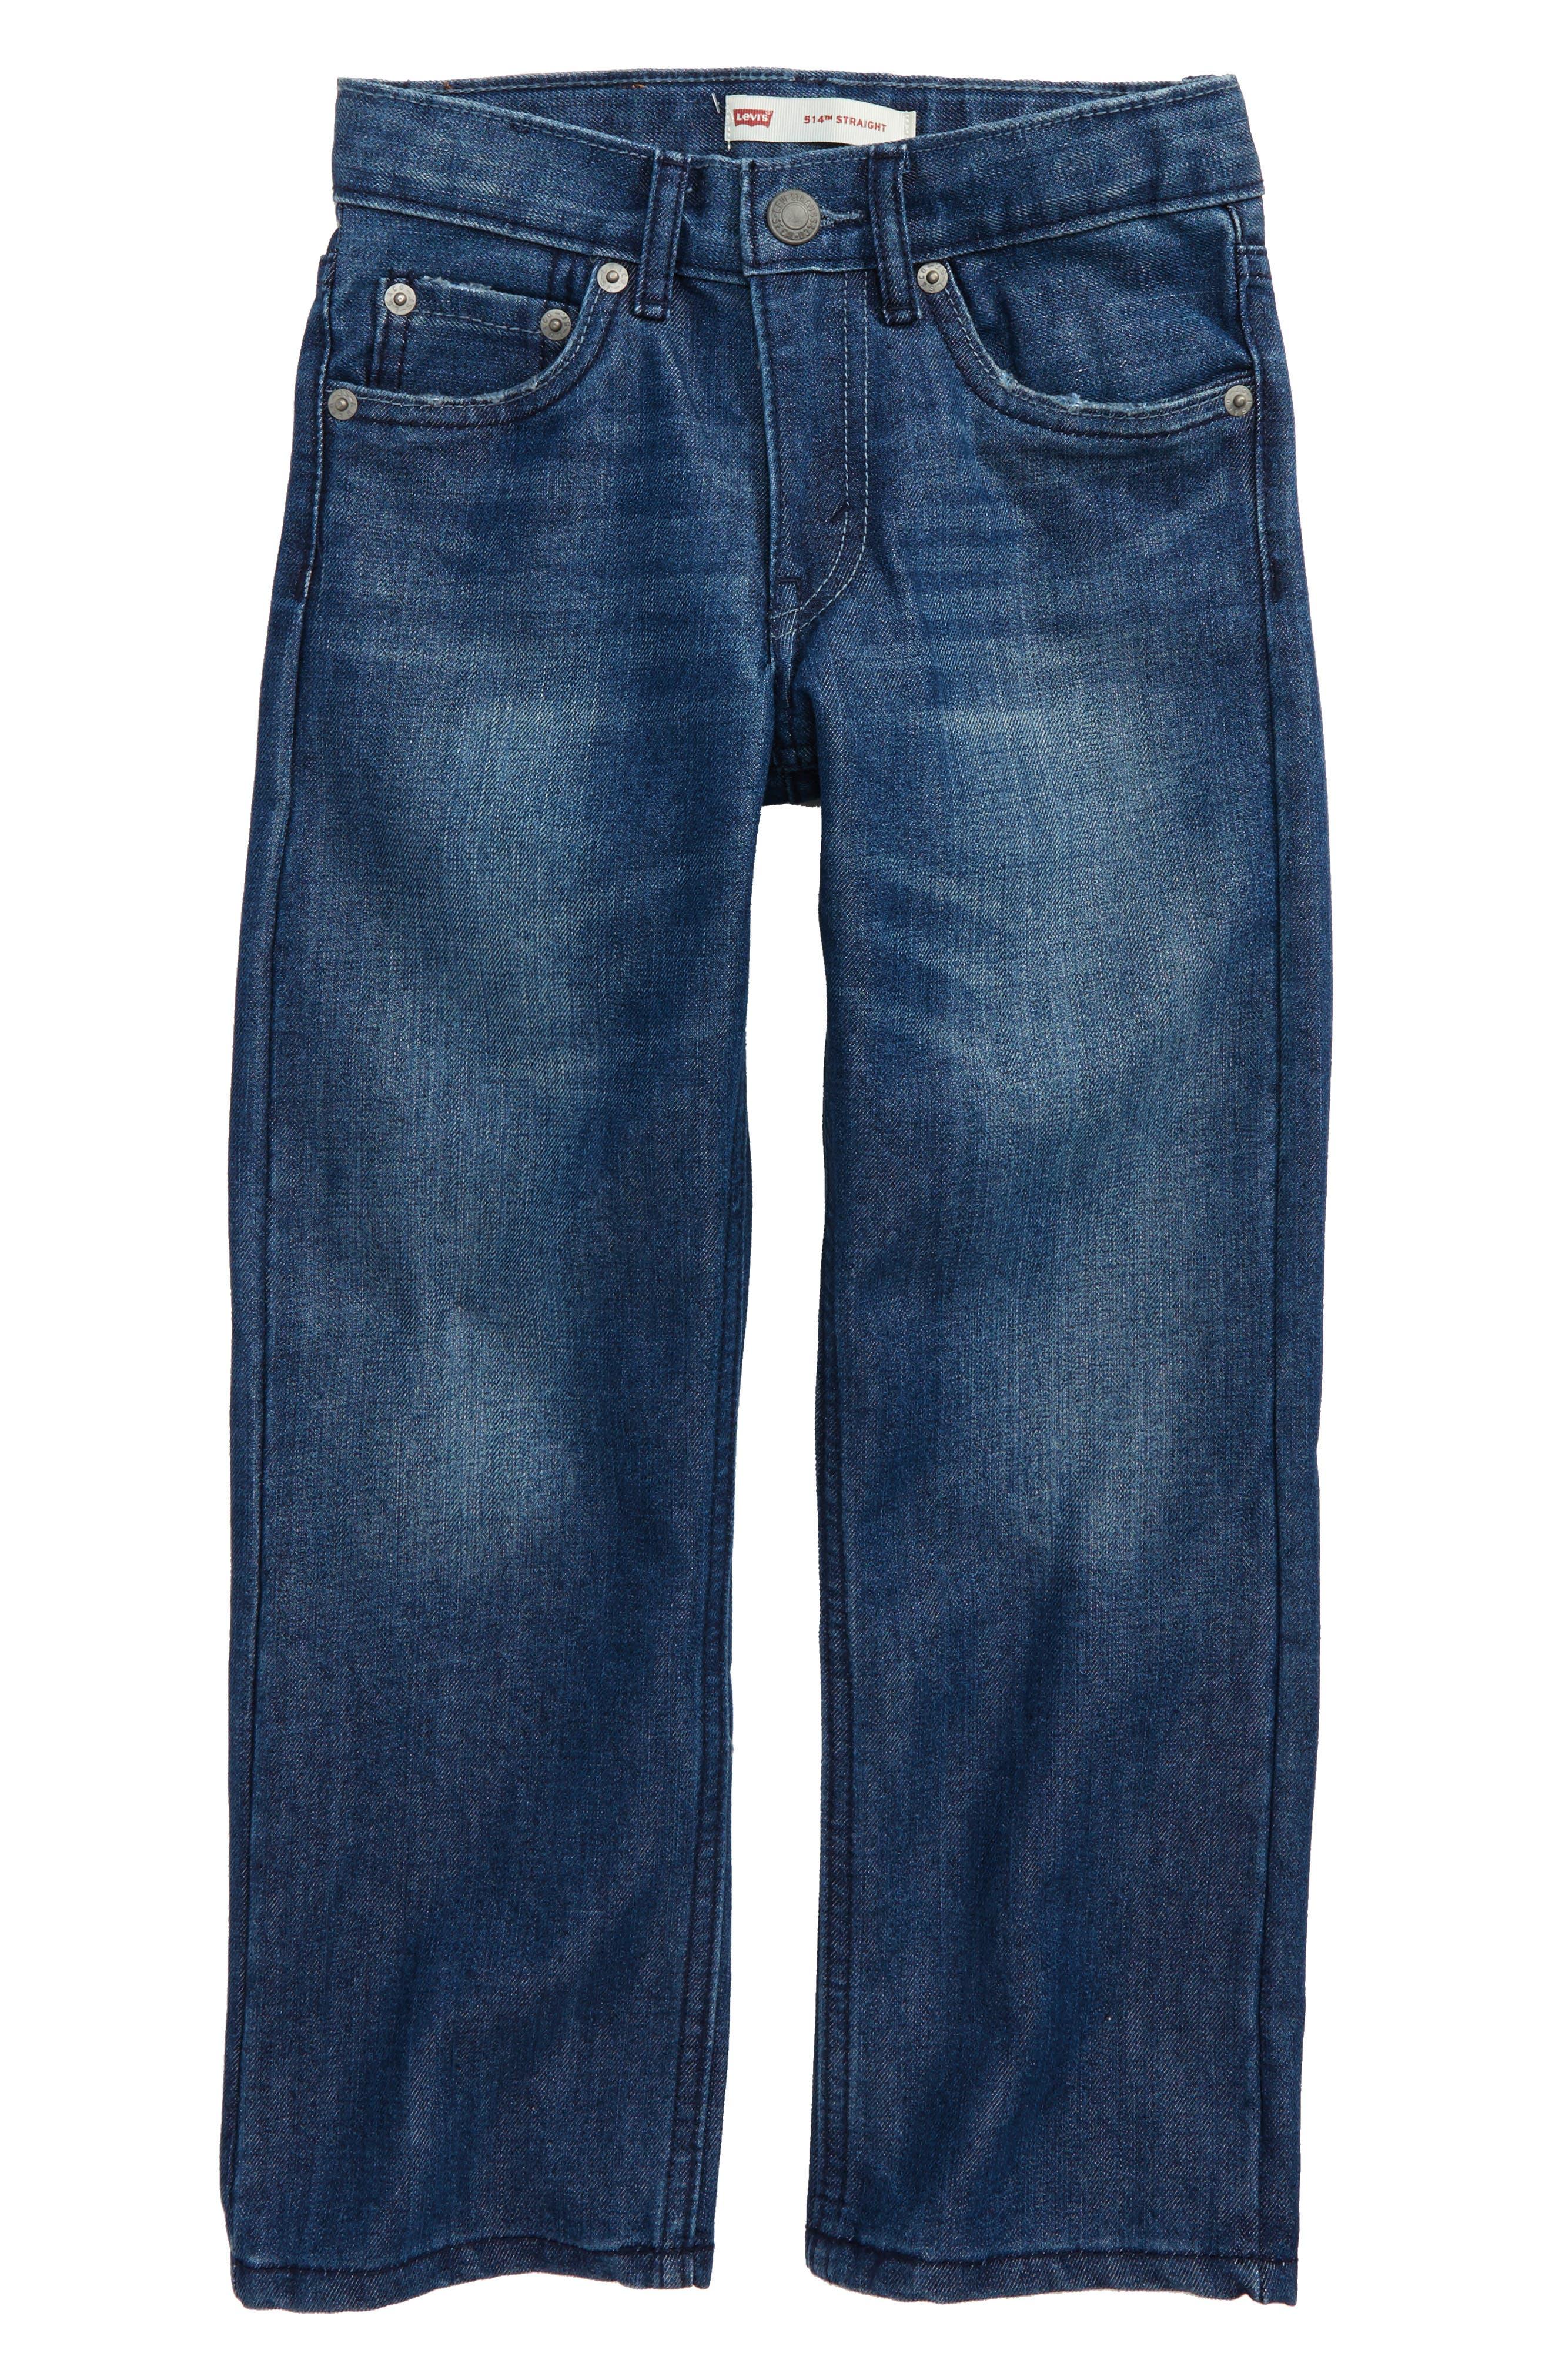 Main Image - Levi's® 514™ Straight Leg Jeans (Toddler Boys & Little Boys)